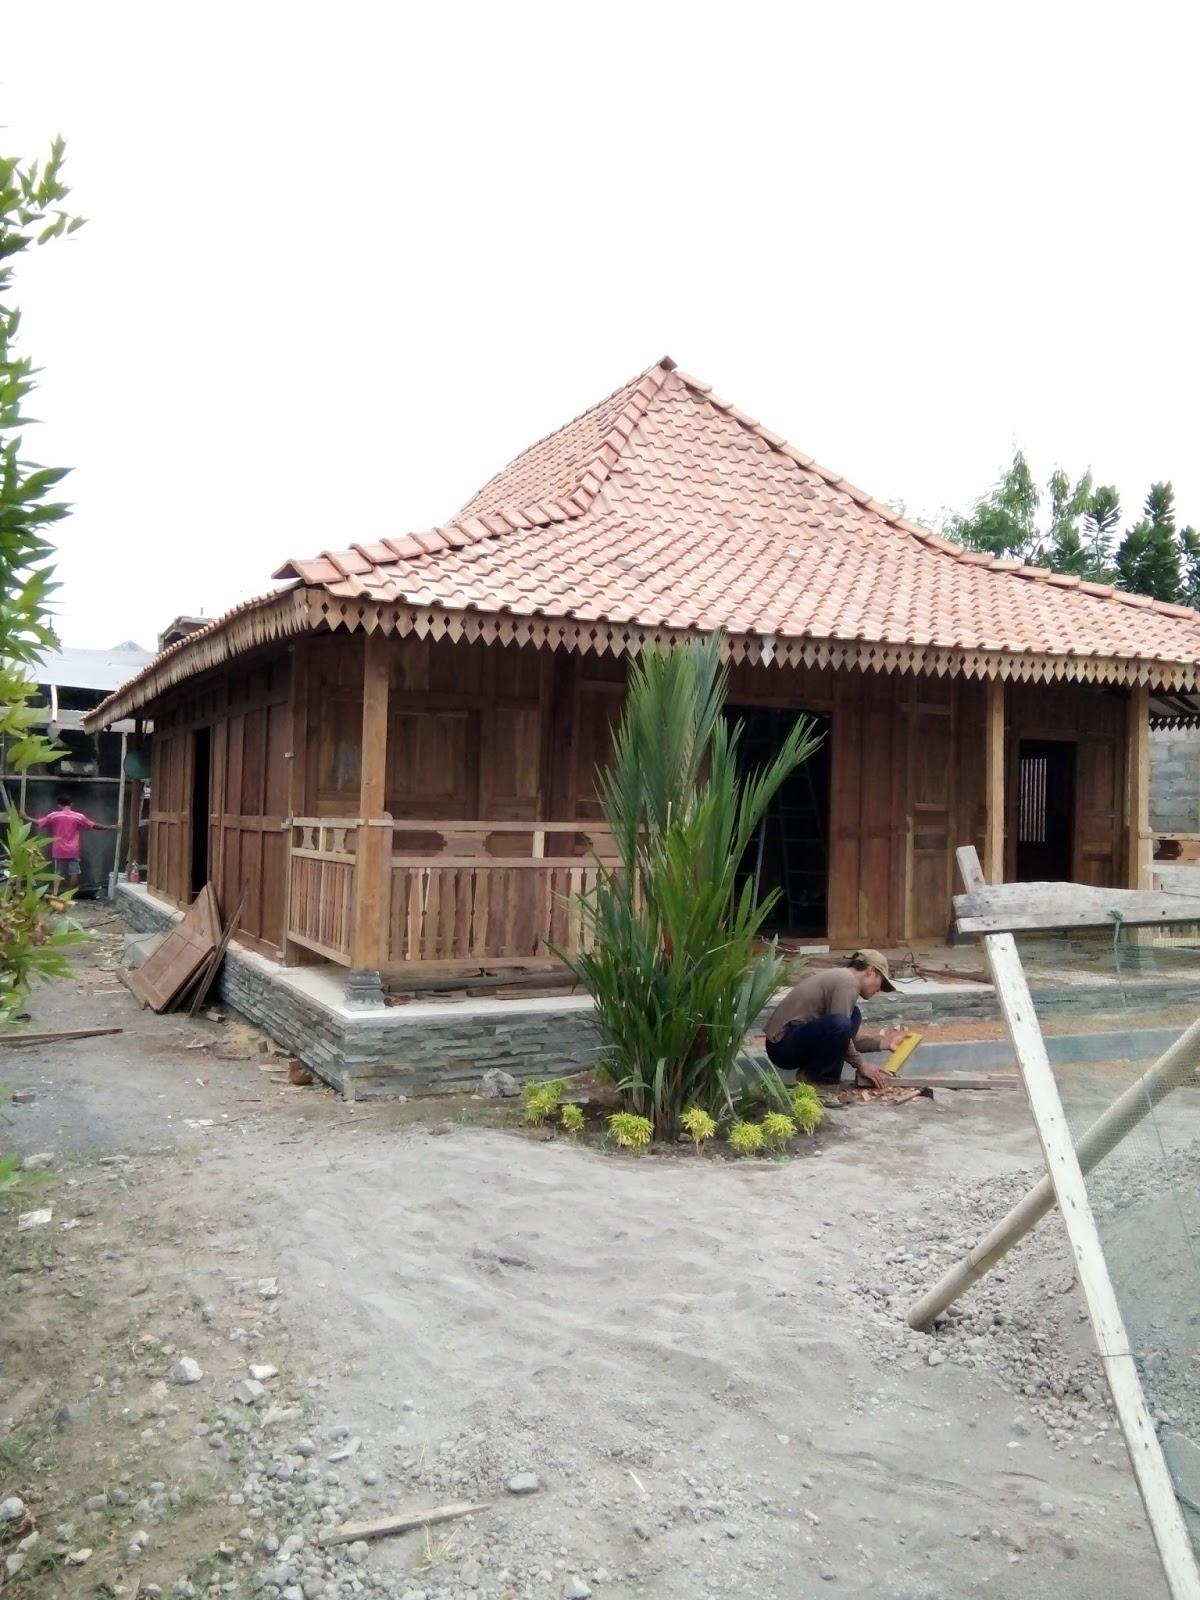 Dijual Rumah Limasan Tebal Tiang Utama 12 Cm Ndalem Jawi Antique